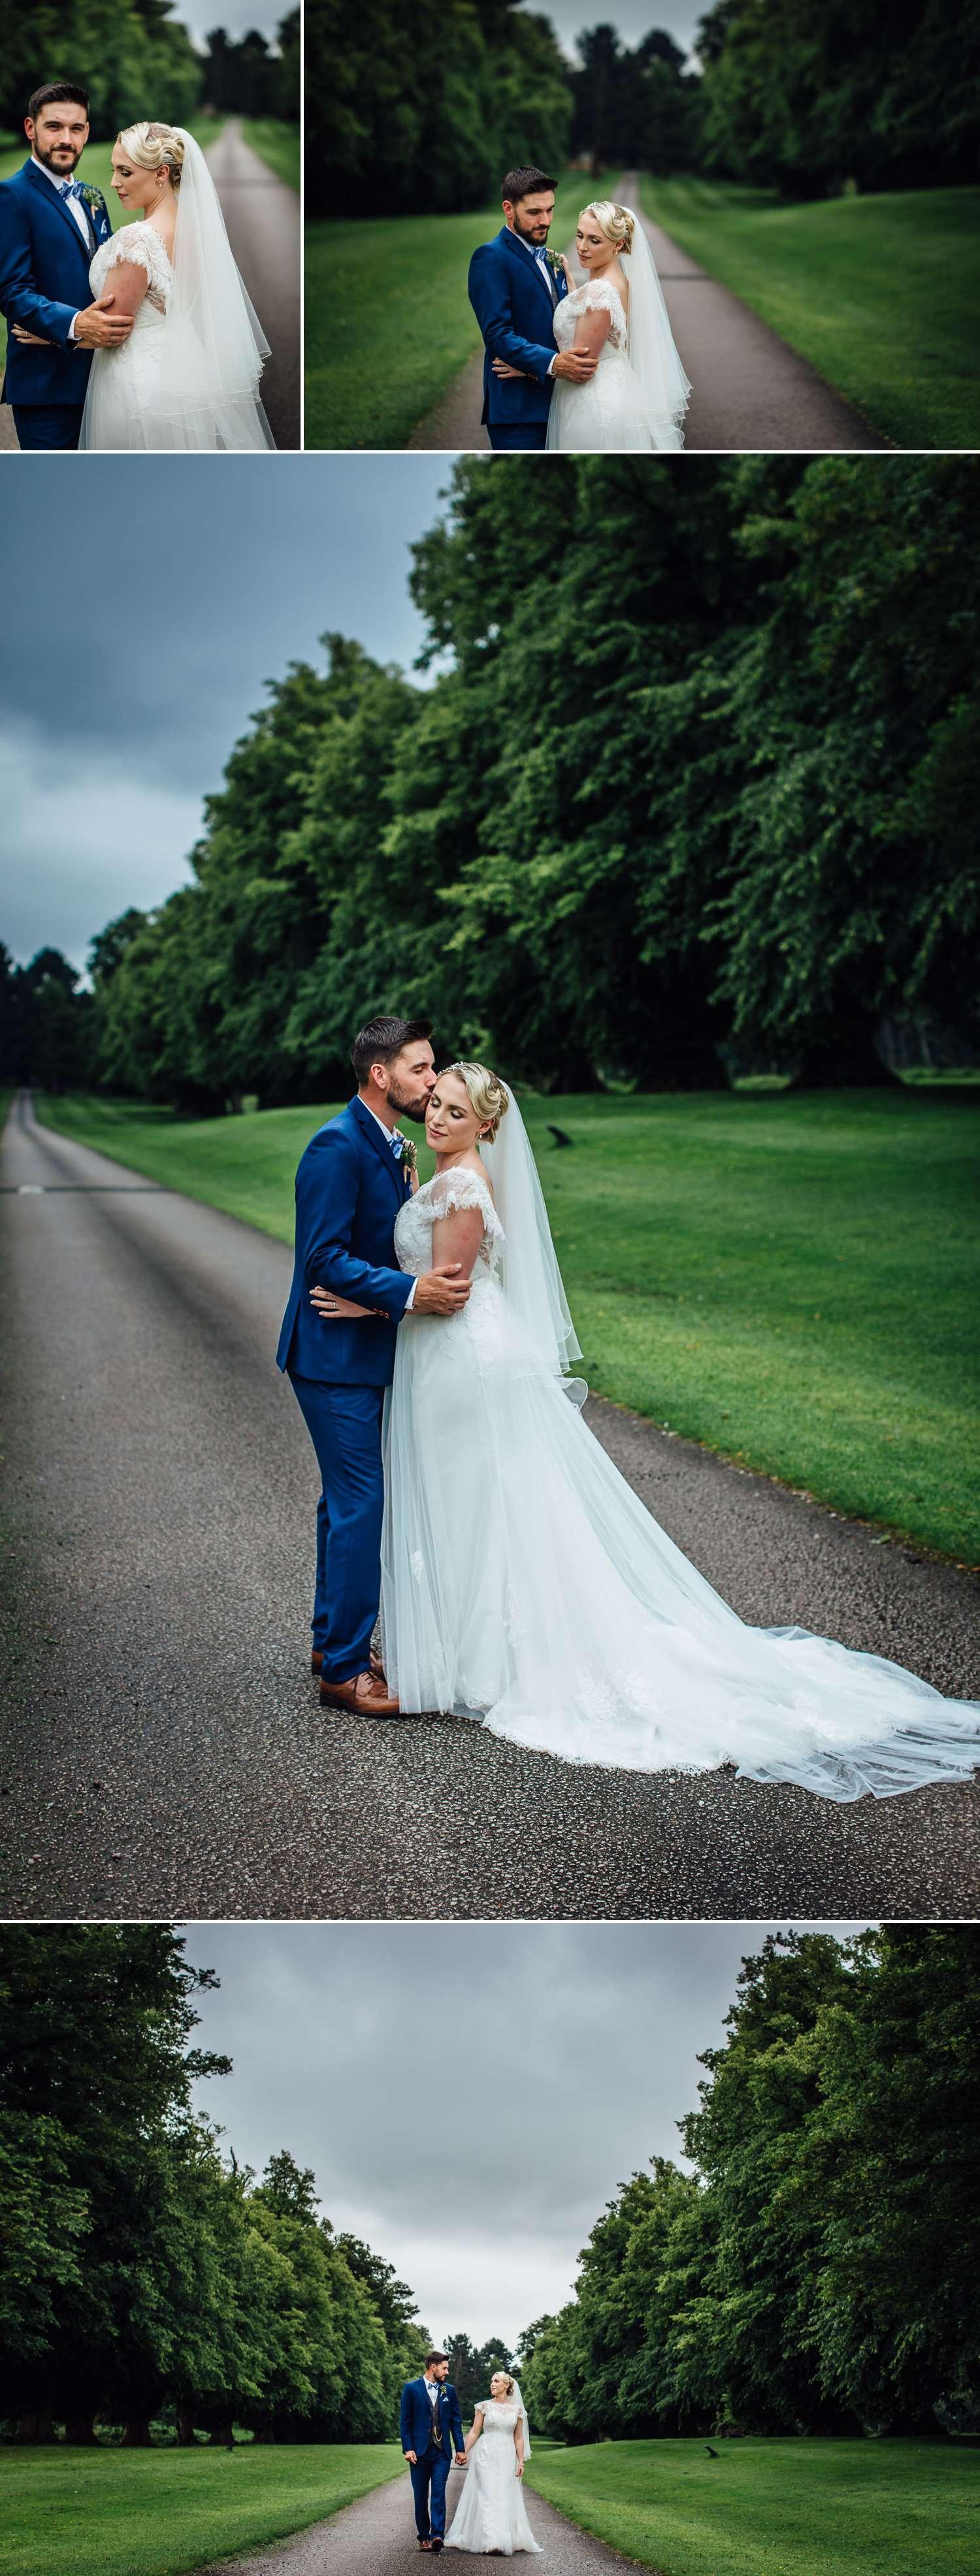 Wedding photography in Soughton Hall Driveway. Portraits of wedding couple